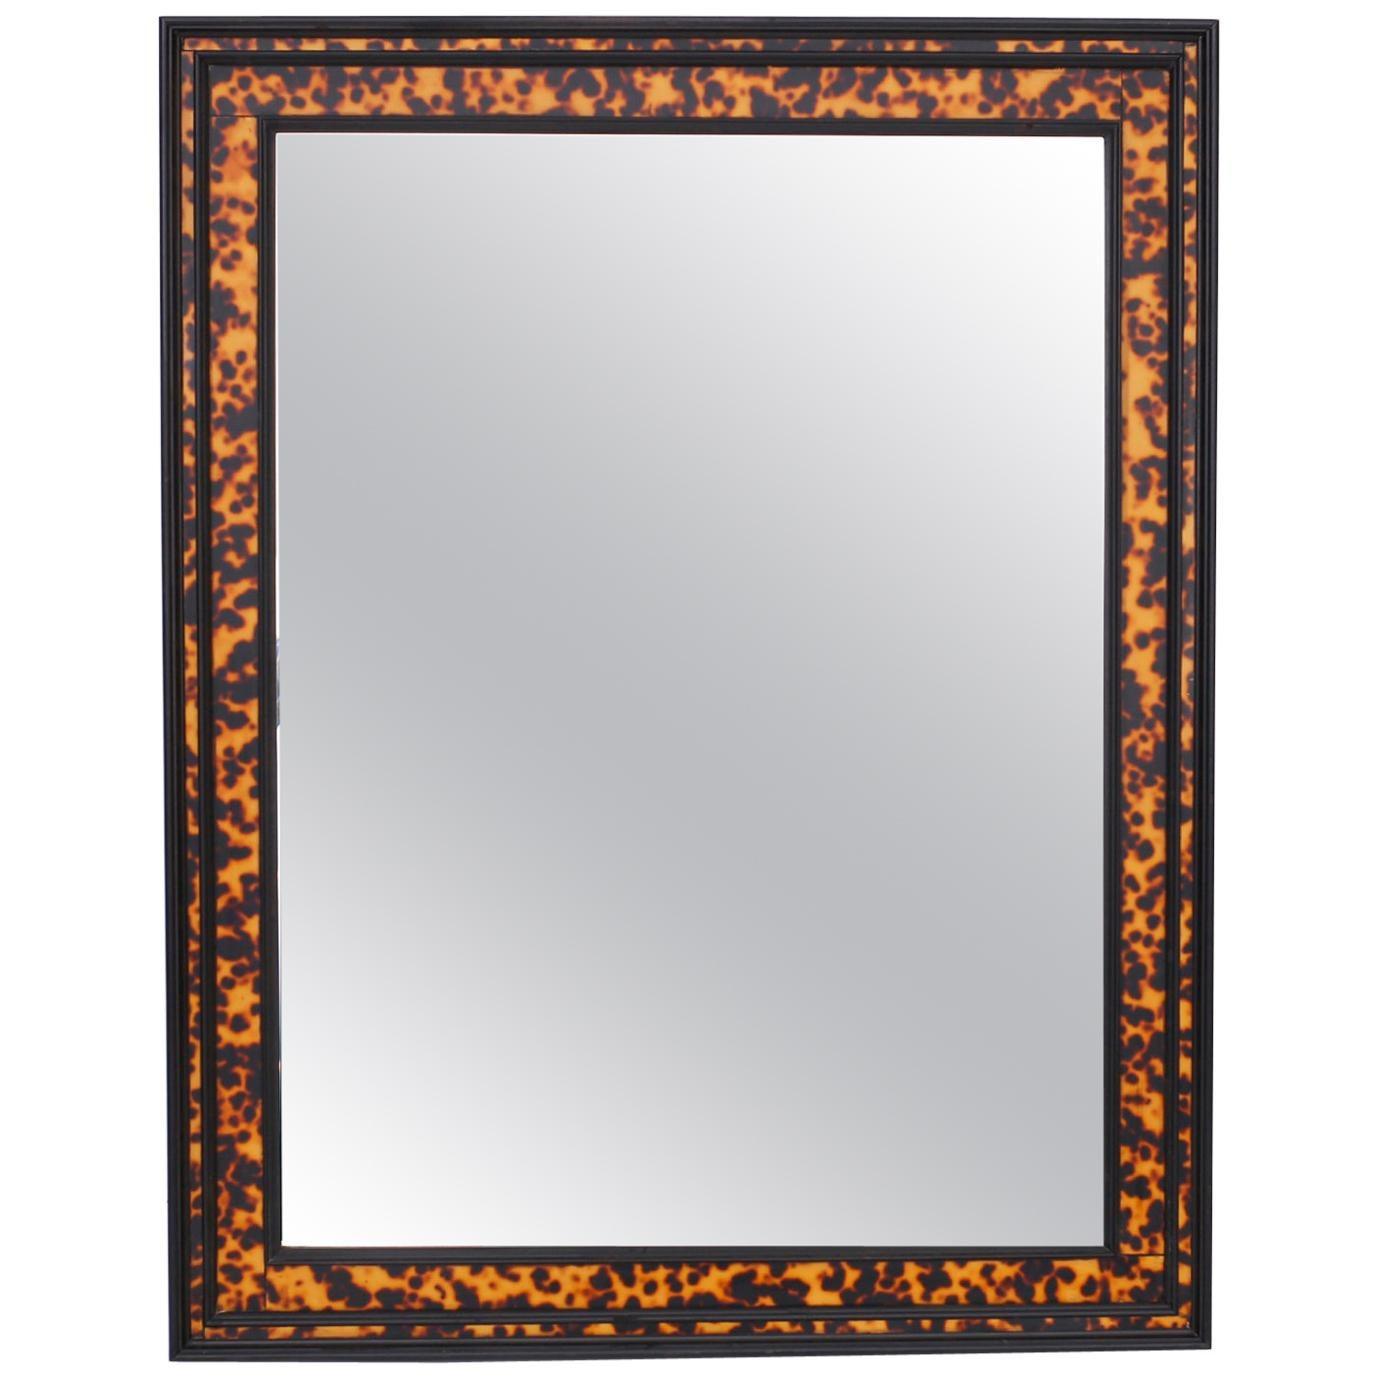 Faux Tortoiseshell Wall Mirror